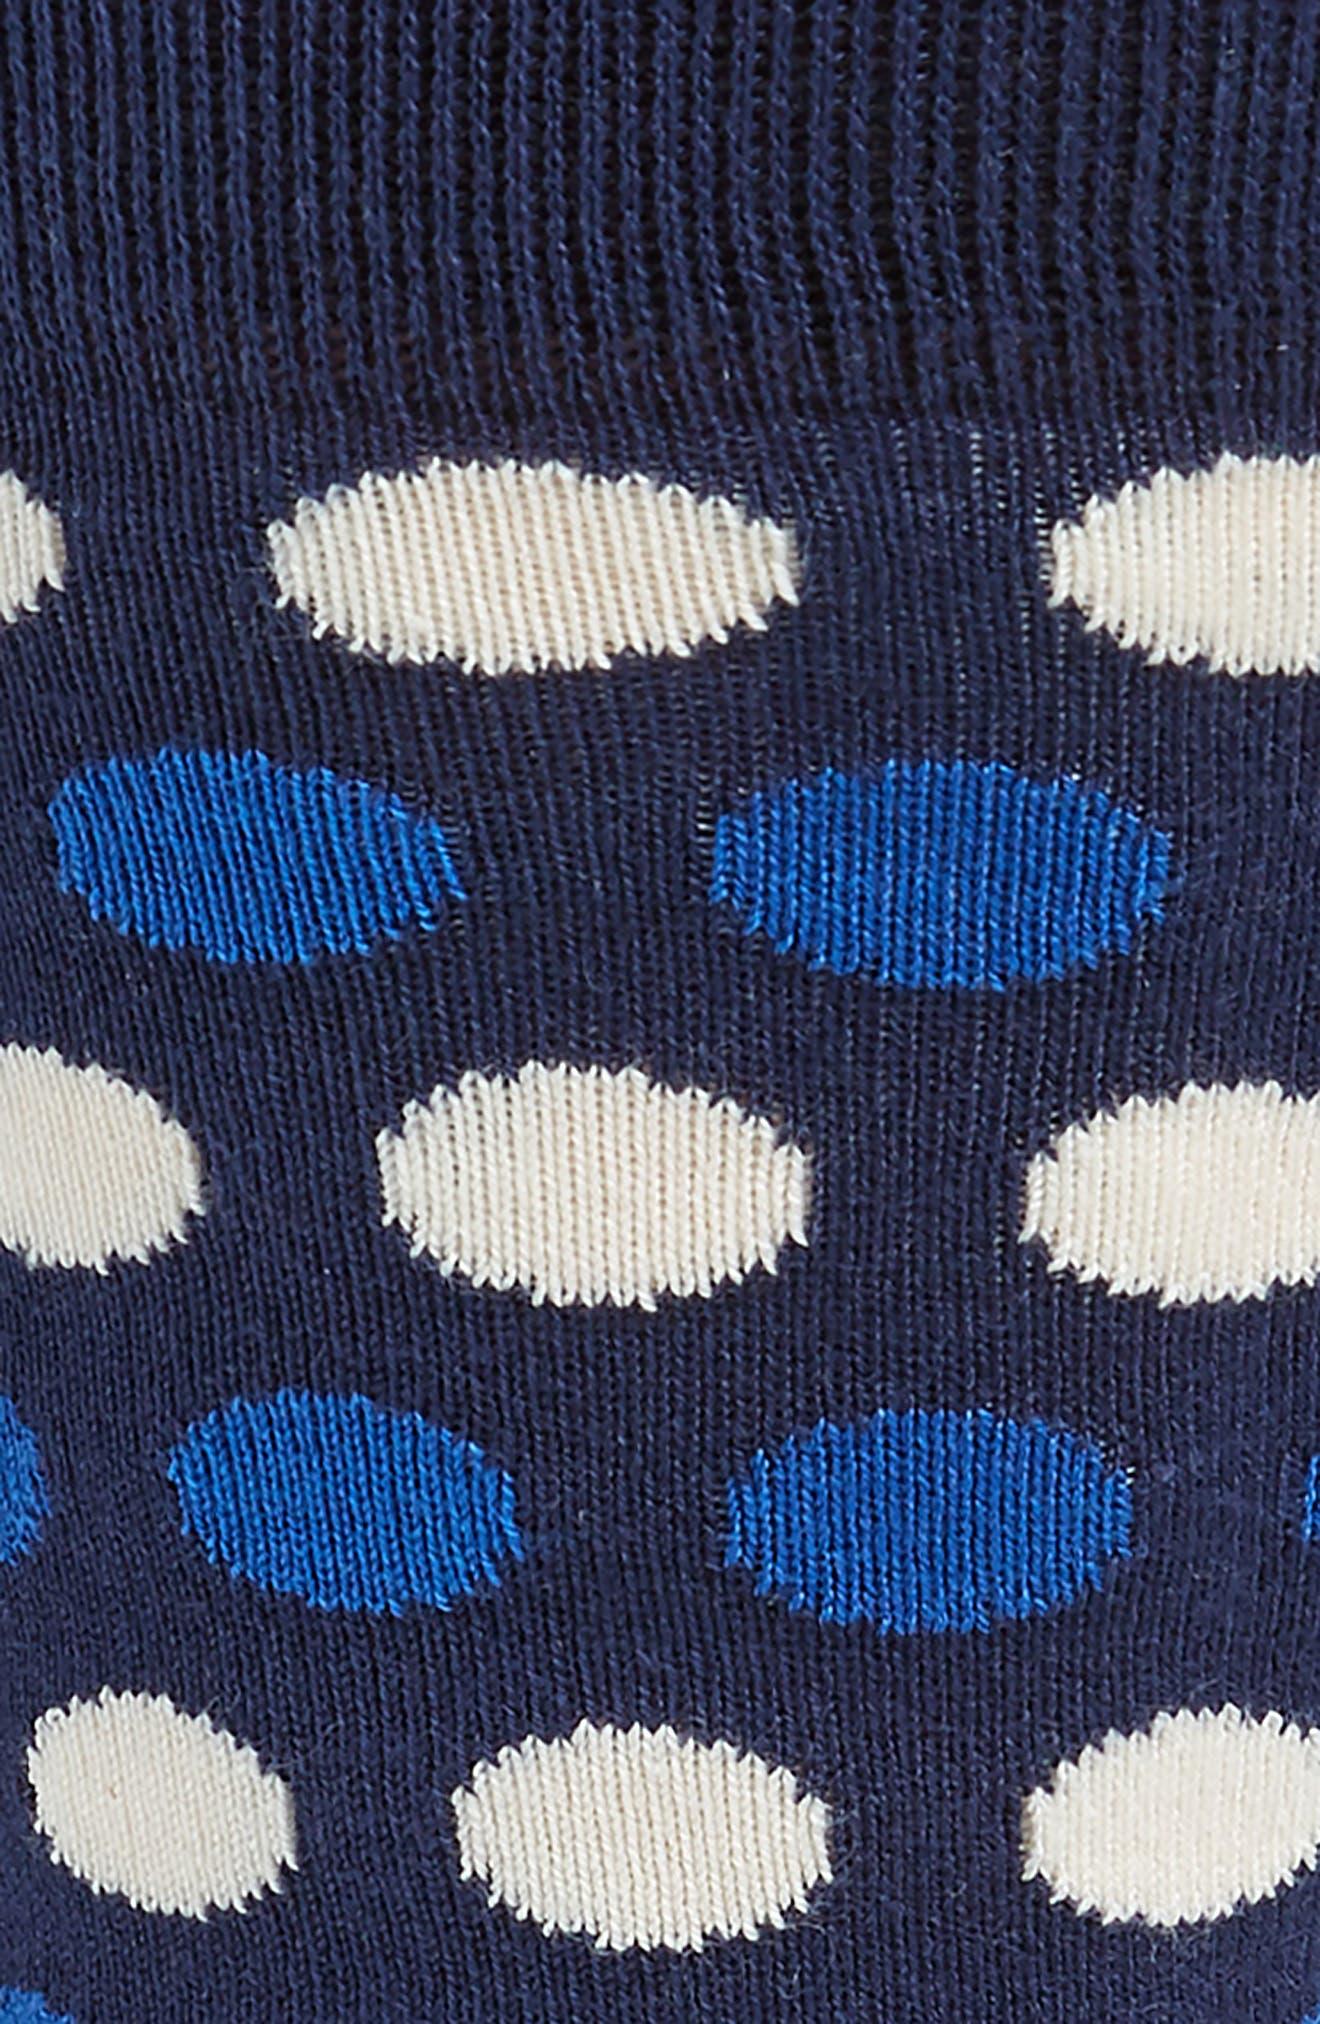 PAUL SMITH, Dot Stripe Socks, Alternate thumbnail 2, color, NAVY